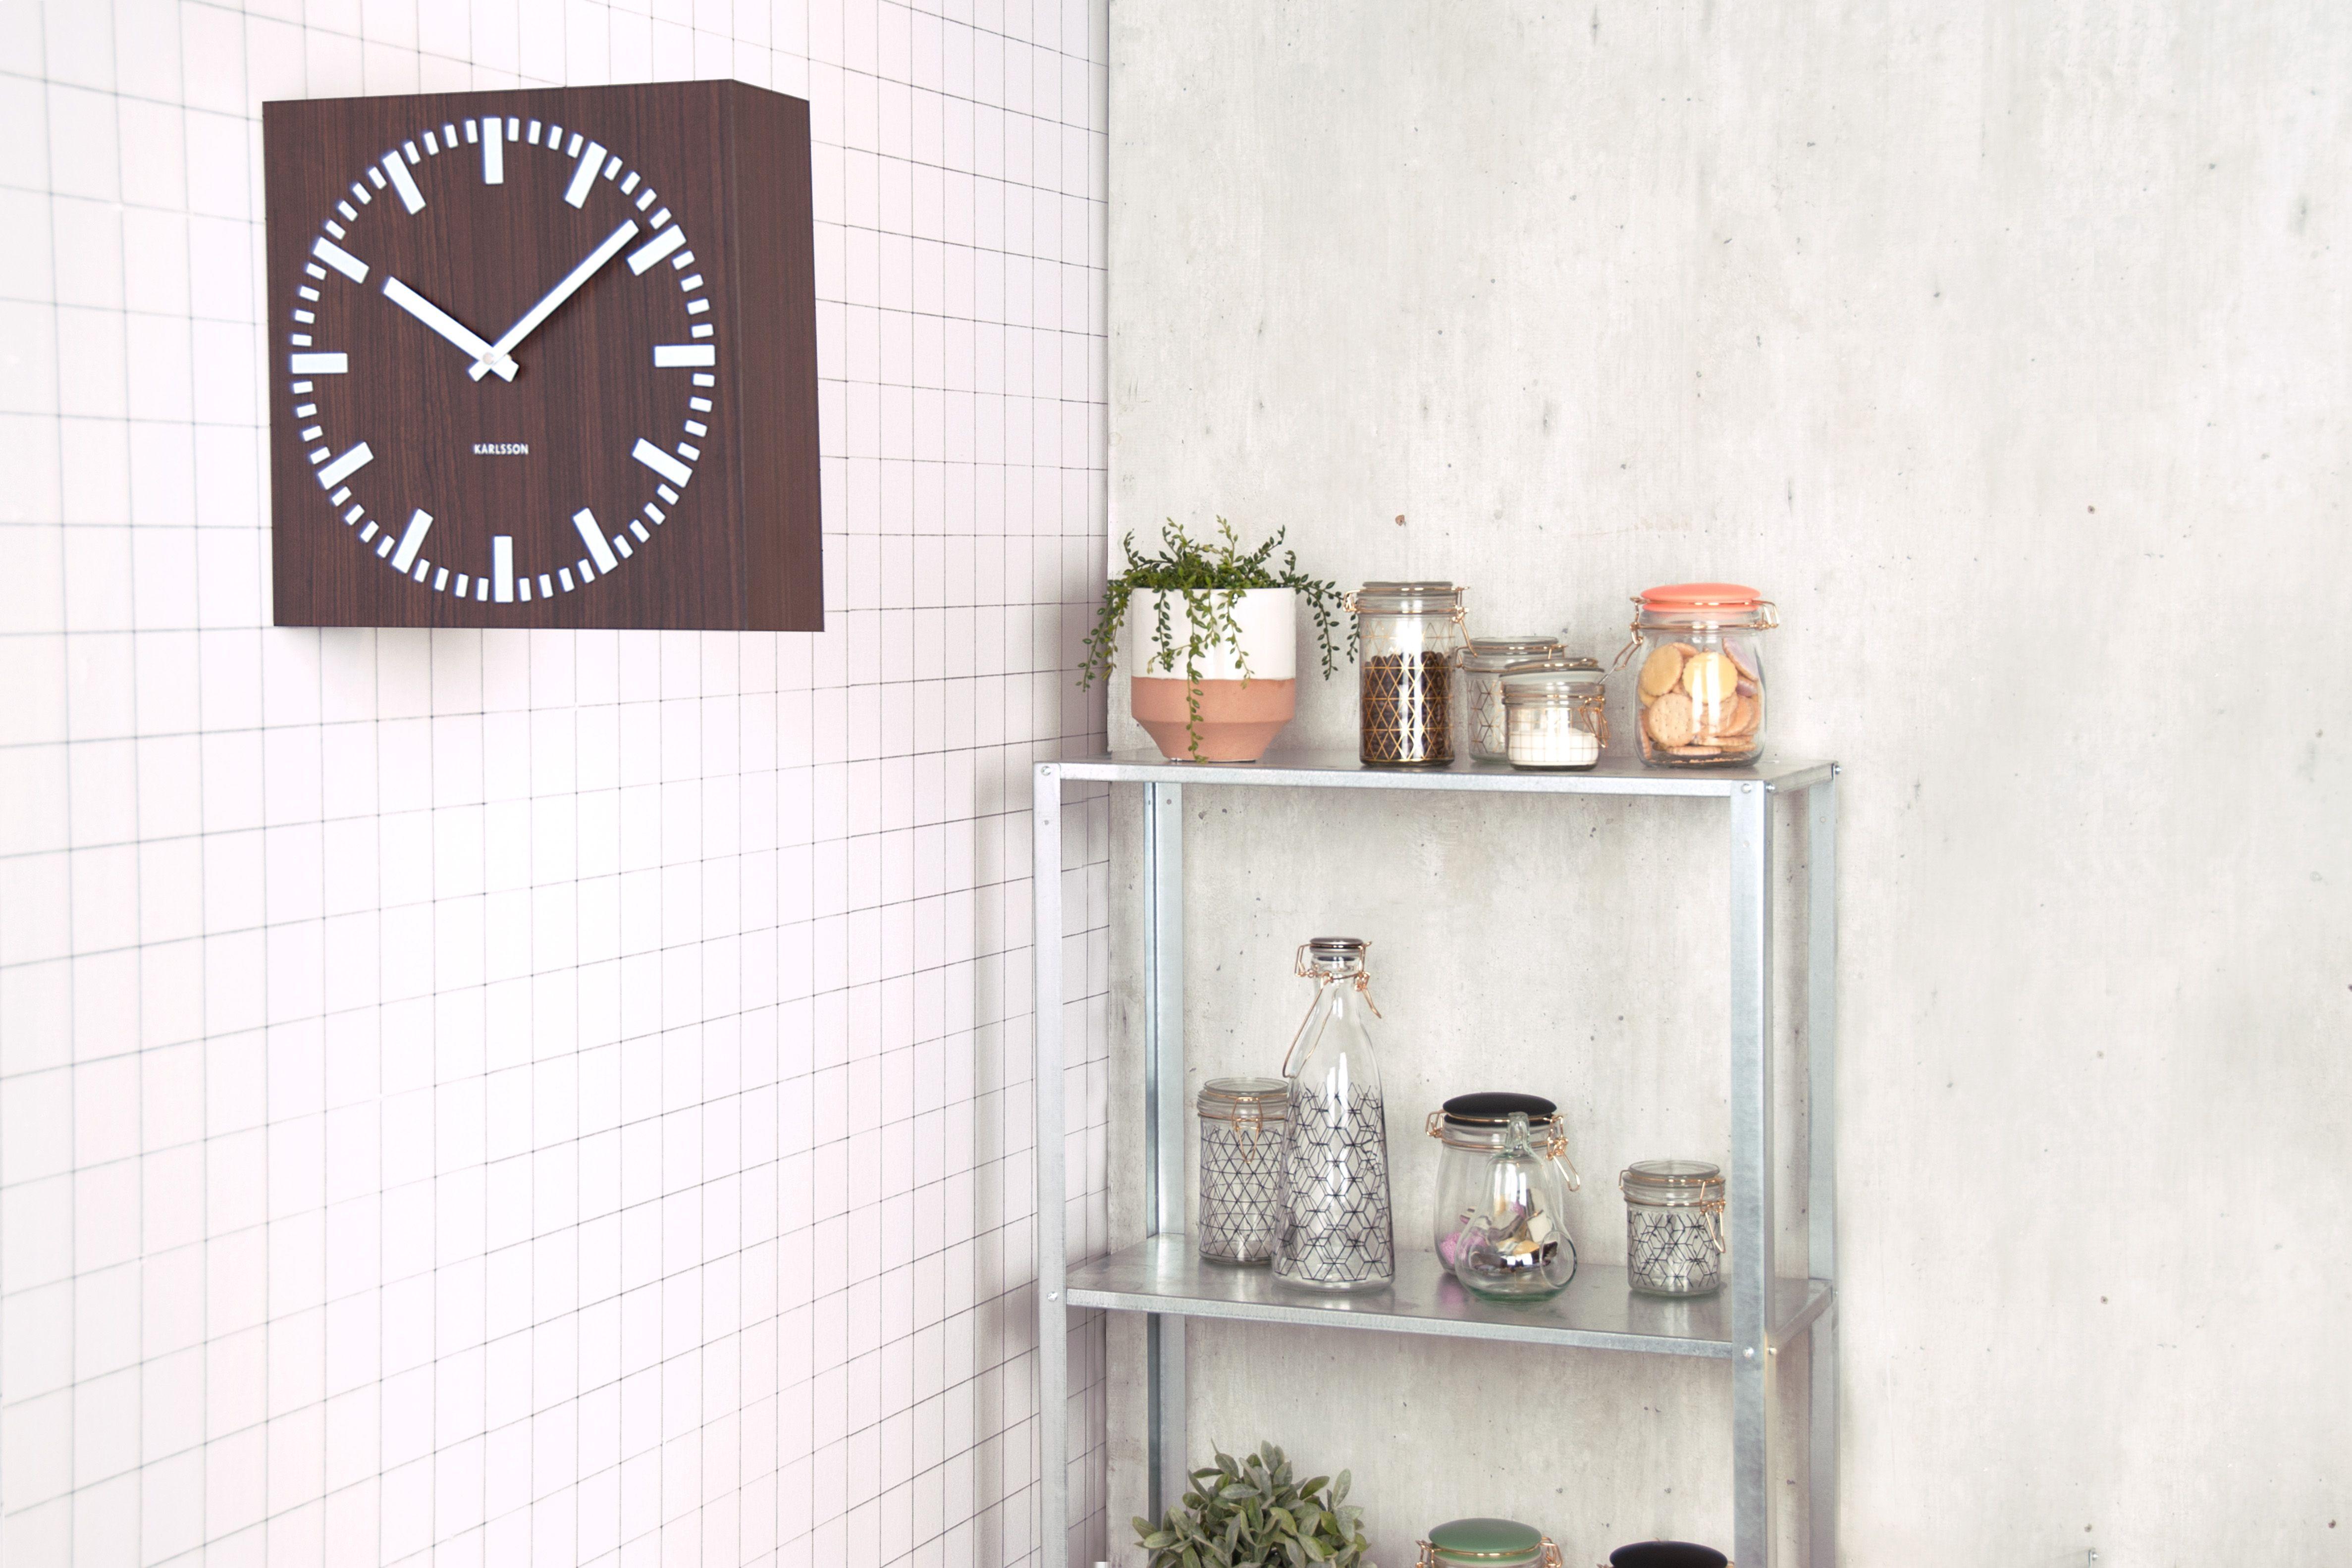 Present time woonaccessoires woondecoratie klok modern woonkamer ...